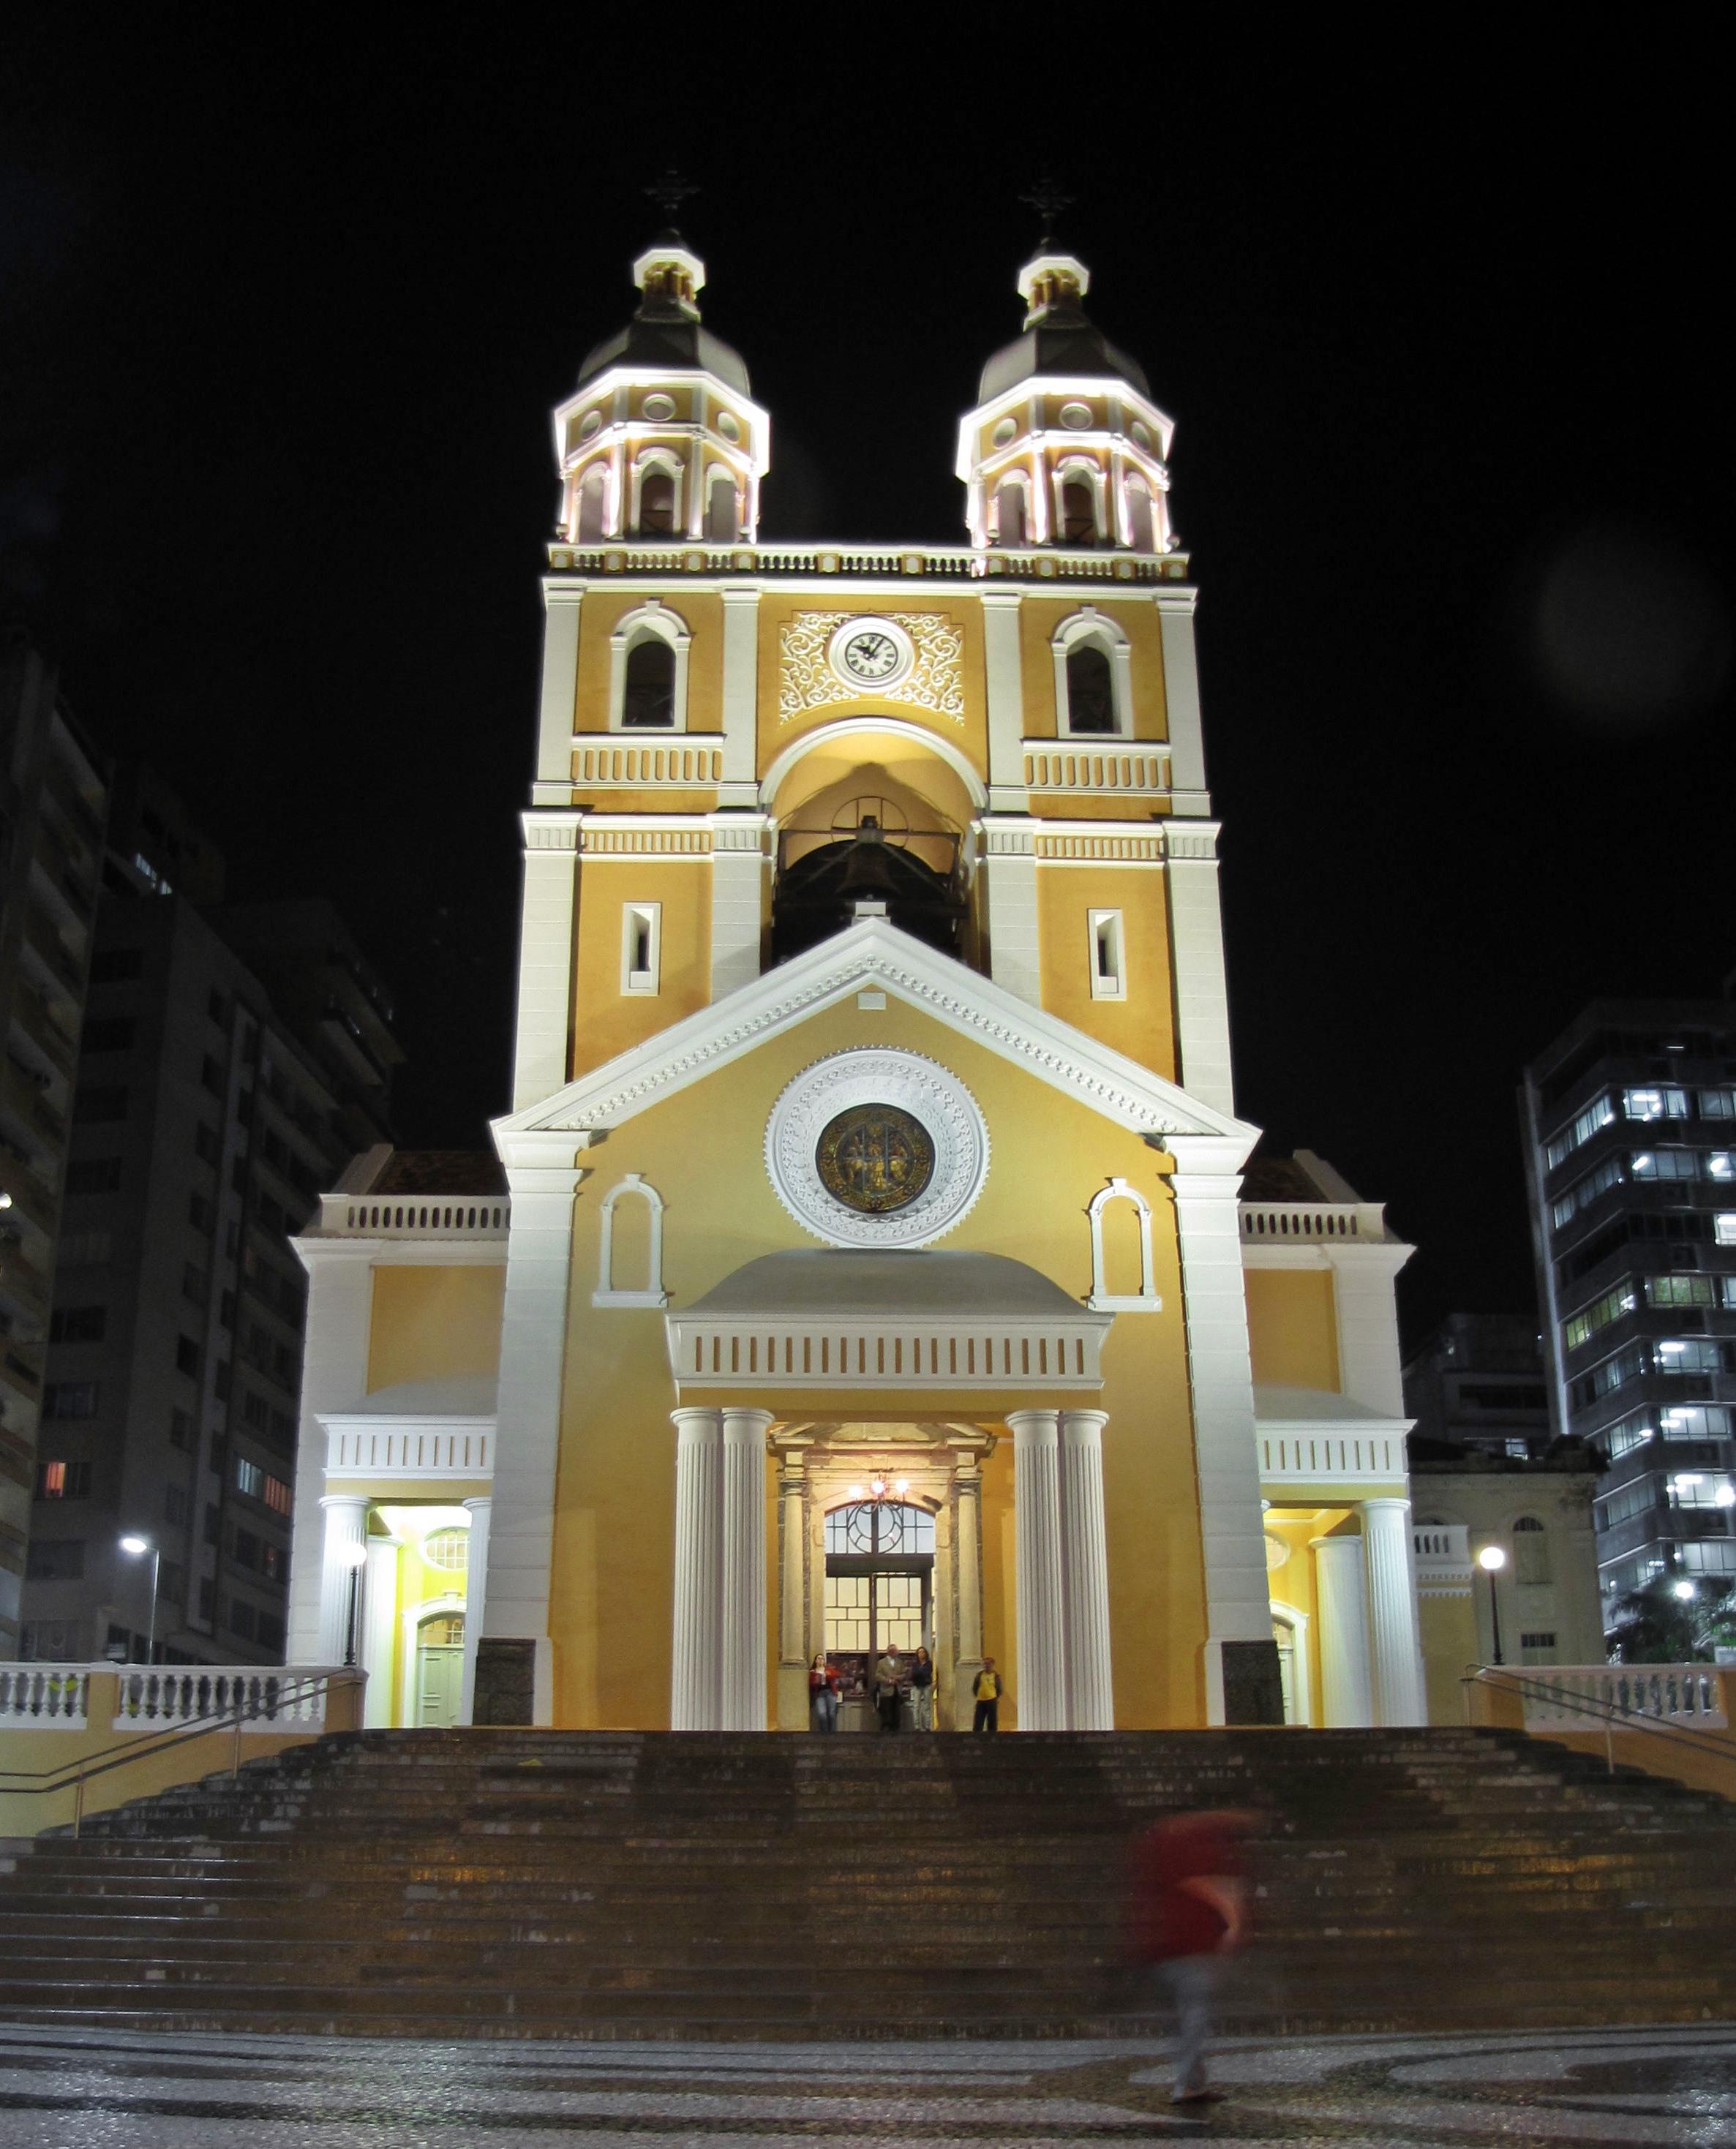 Catarina de sao goncalo rj rua 6 - 4 3